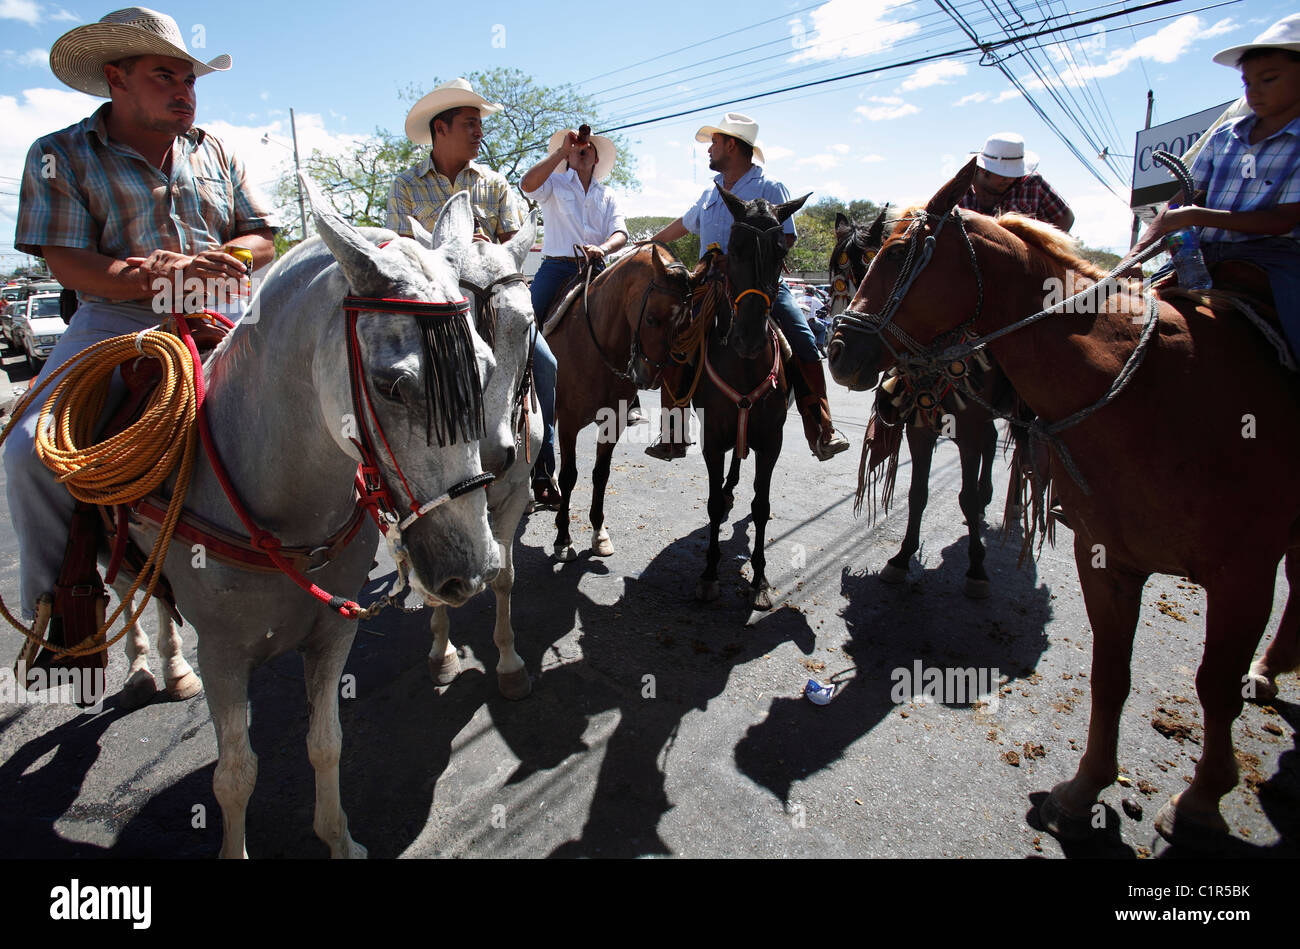 a8e650422 Los hombres de Costa Rica sobre caballos beber cerveza después de  participar en un desfile de